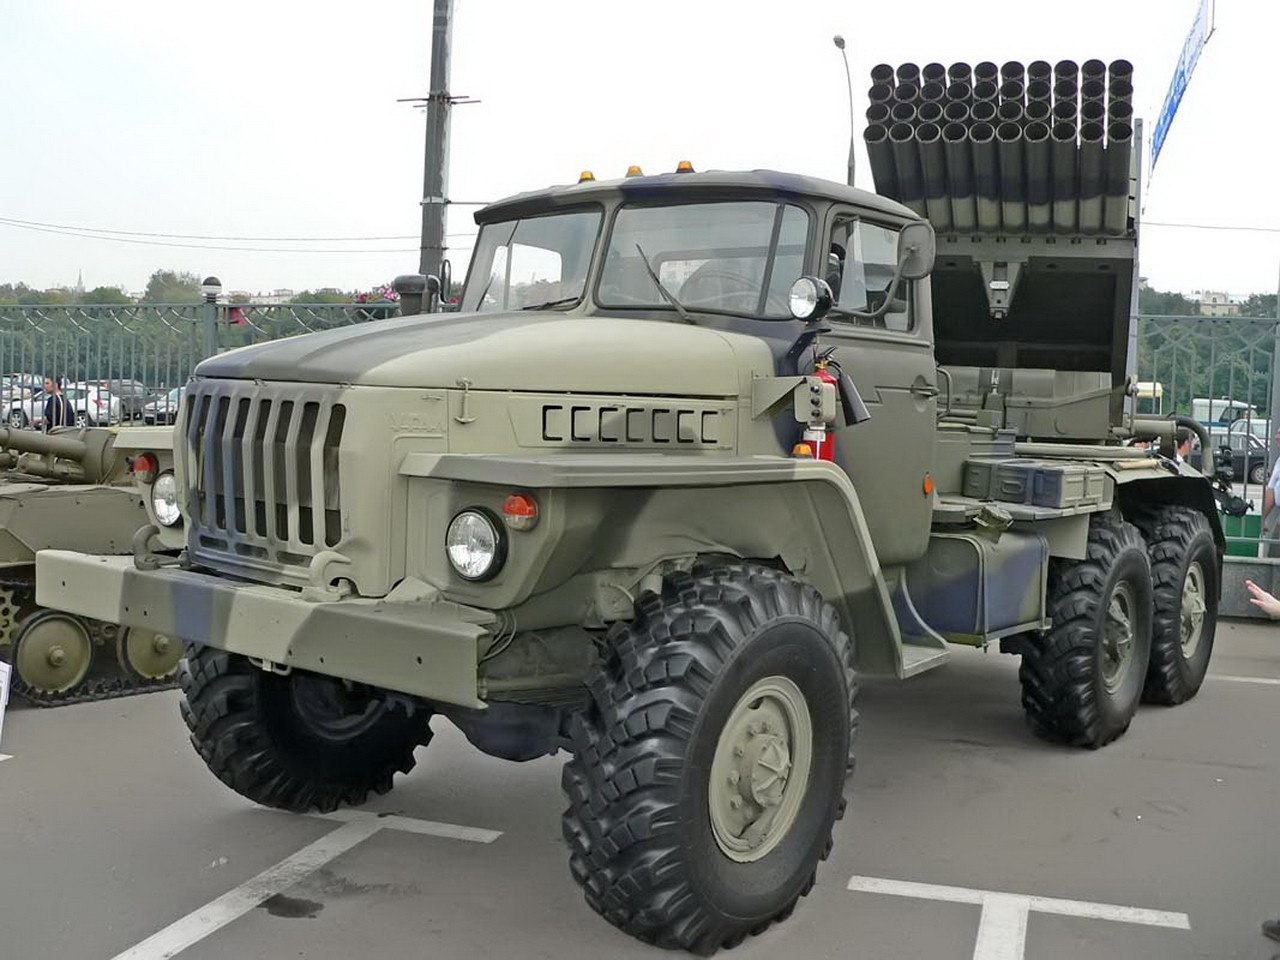 BM-21Grad 차량 중 하나